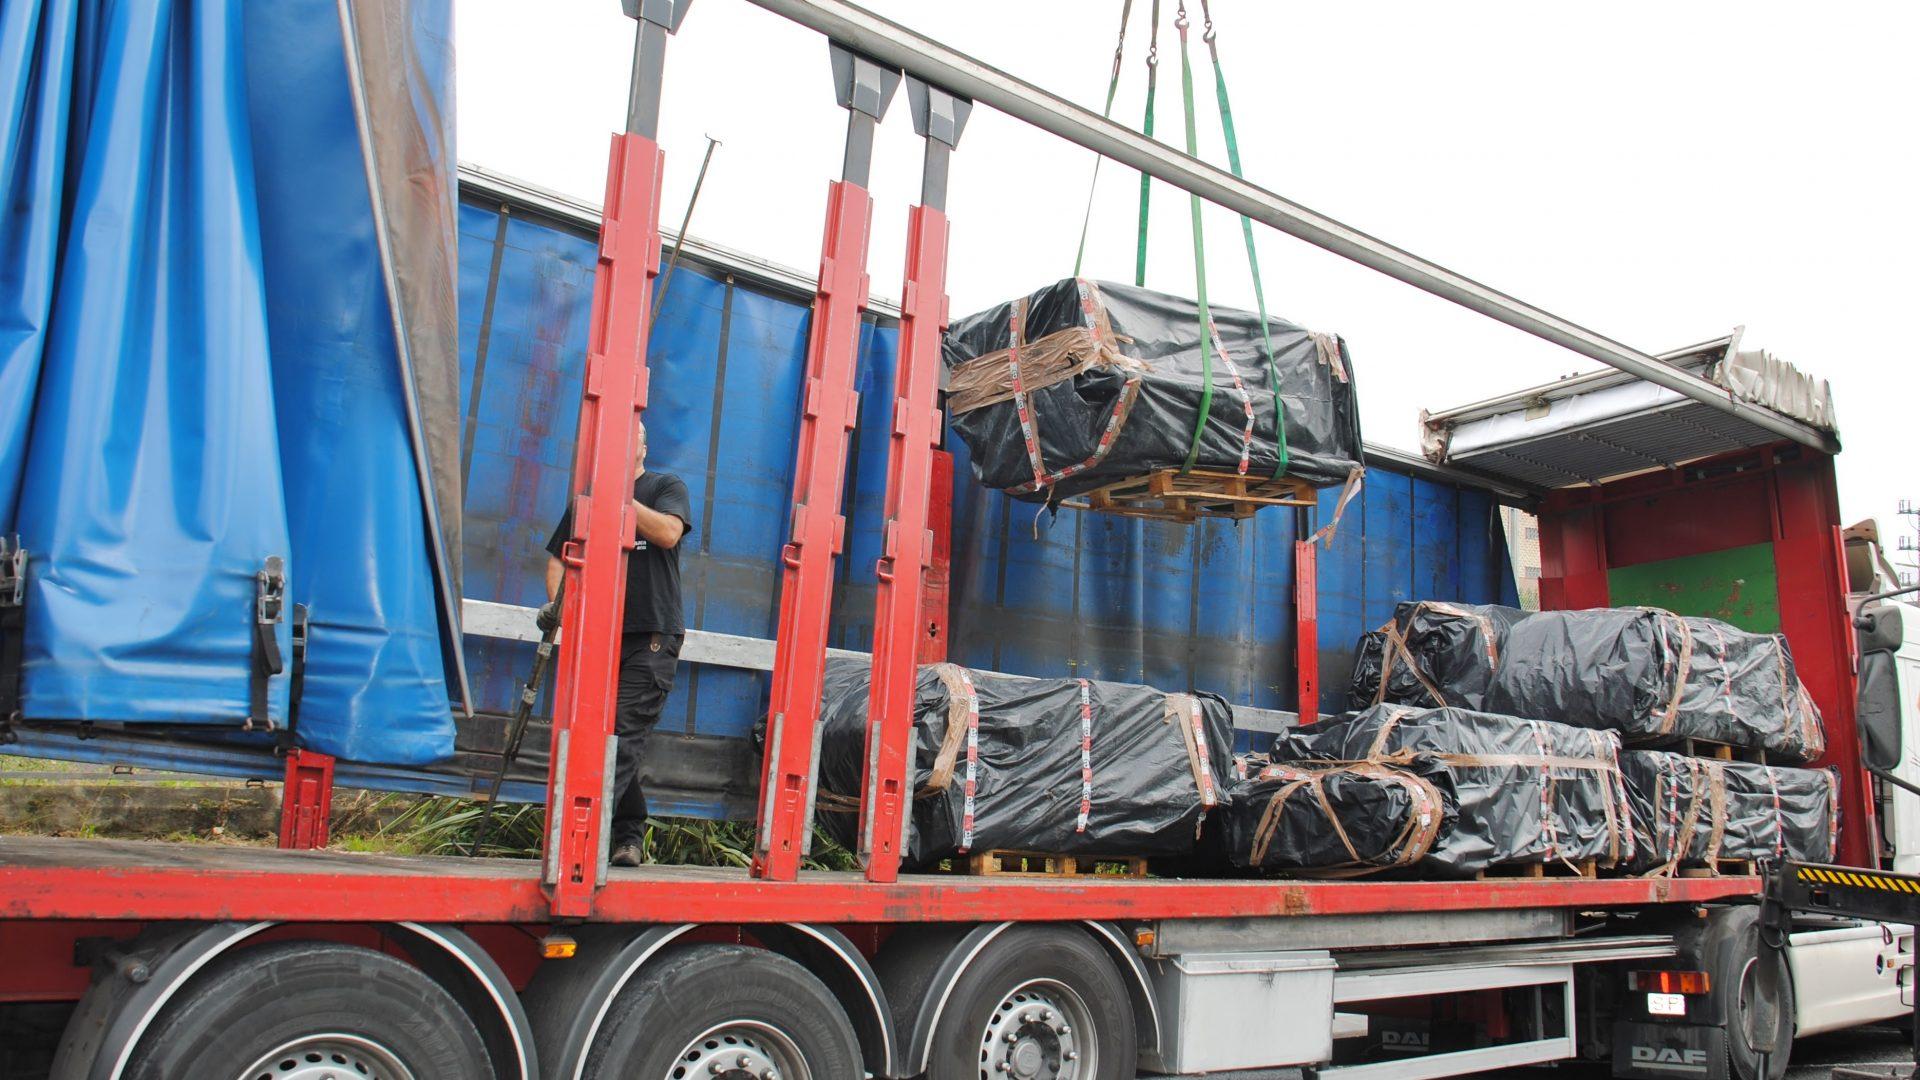 Sourced contaminated scrap metal